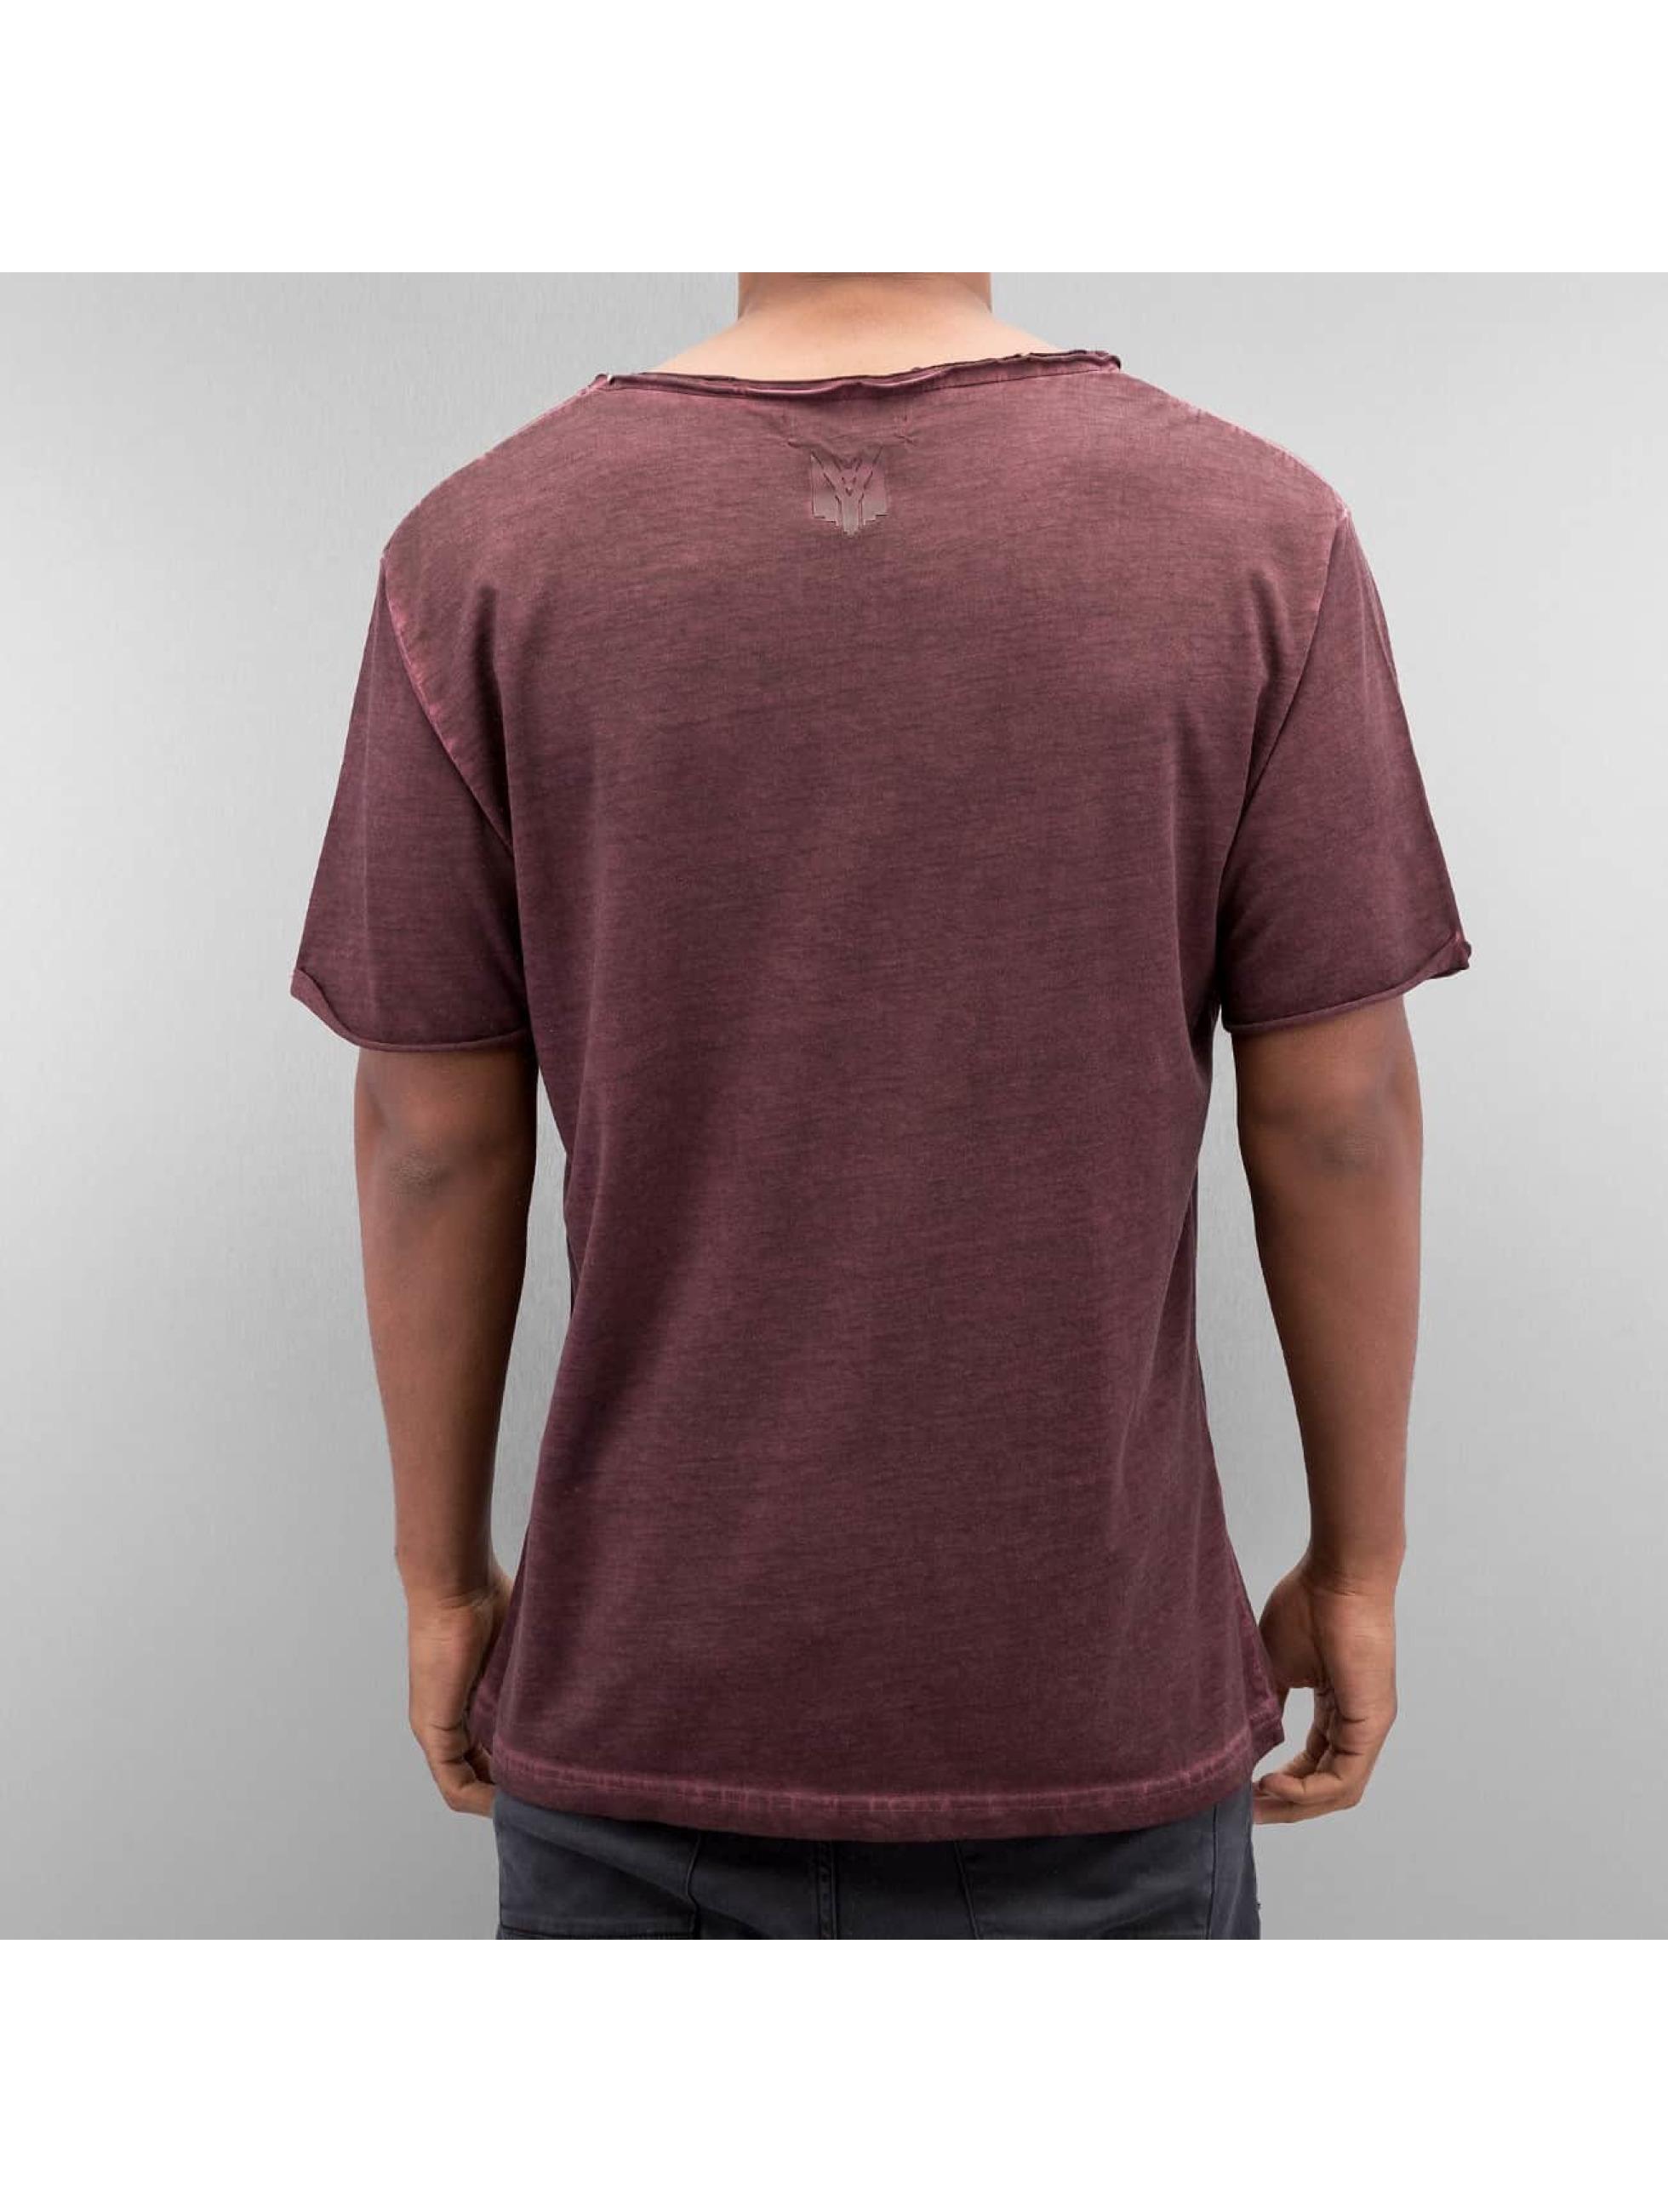 Yezz T-skjorter Dyed red